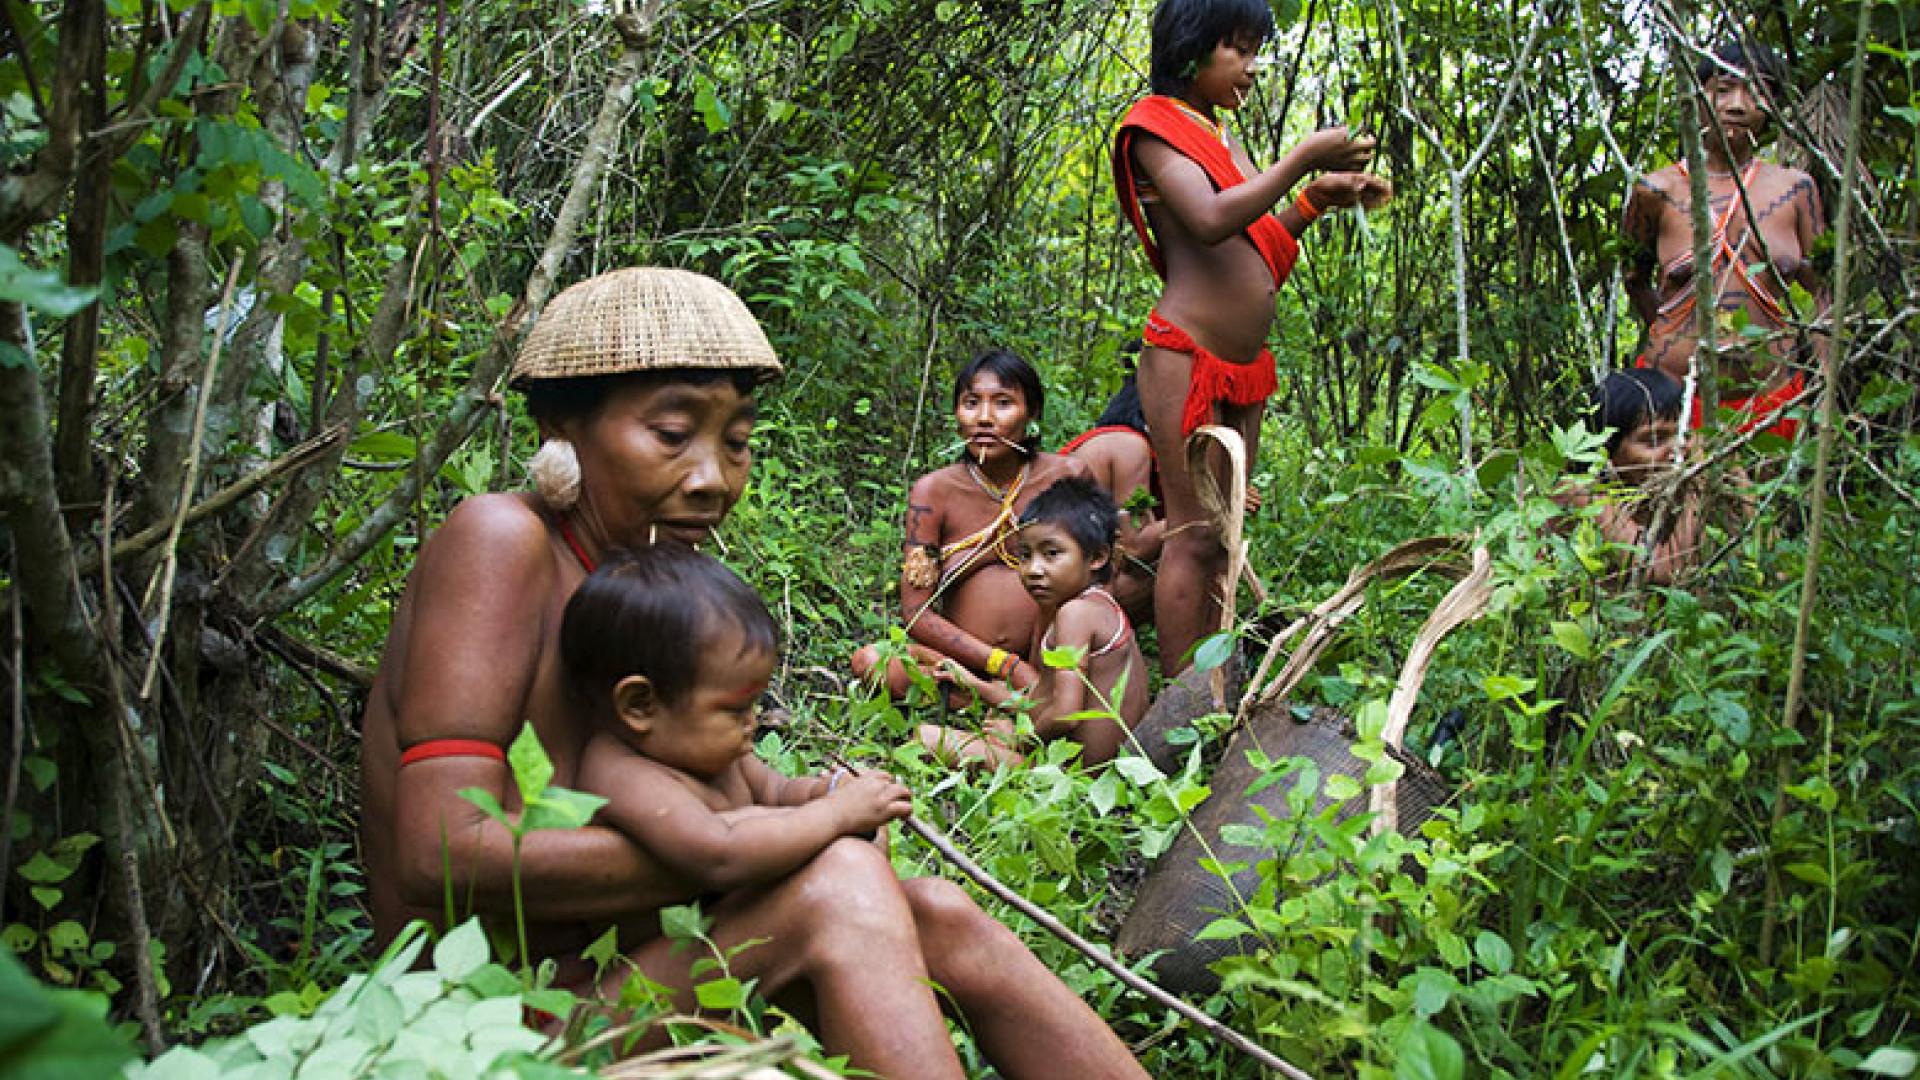 yanomamo people of the rainforest essay